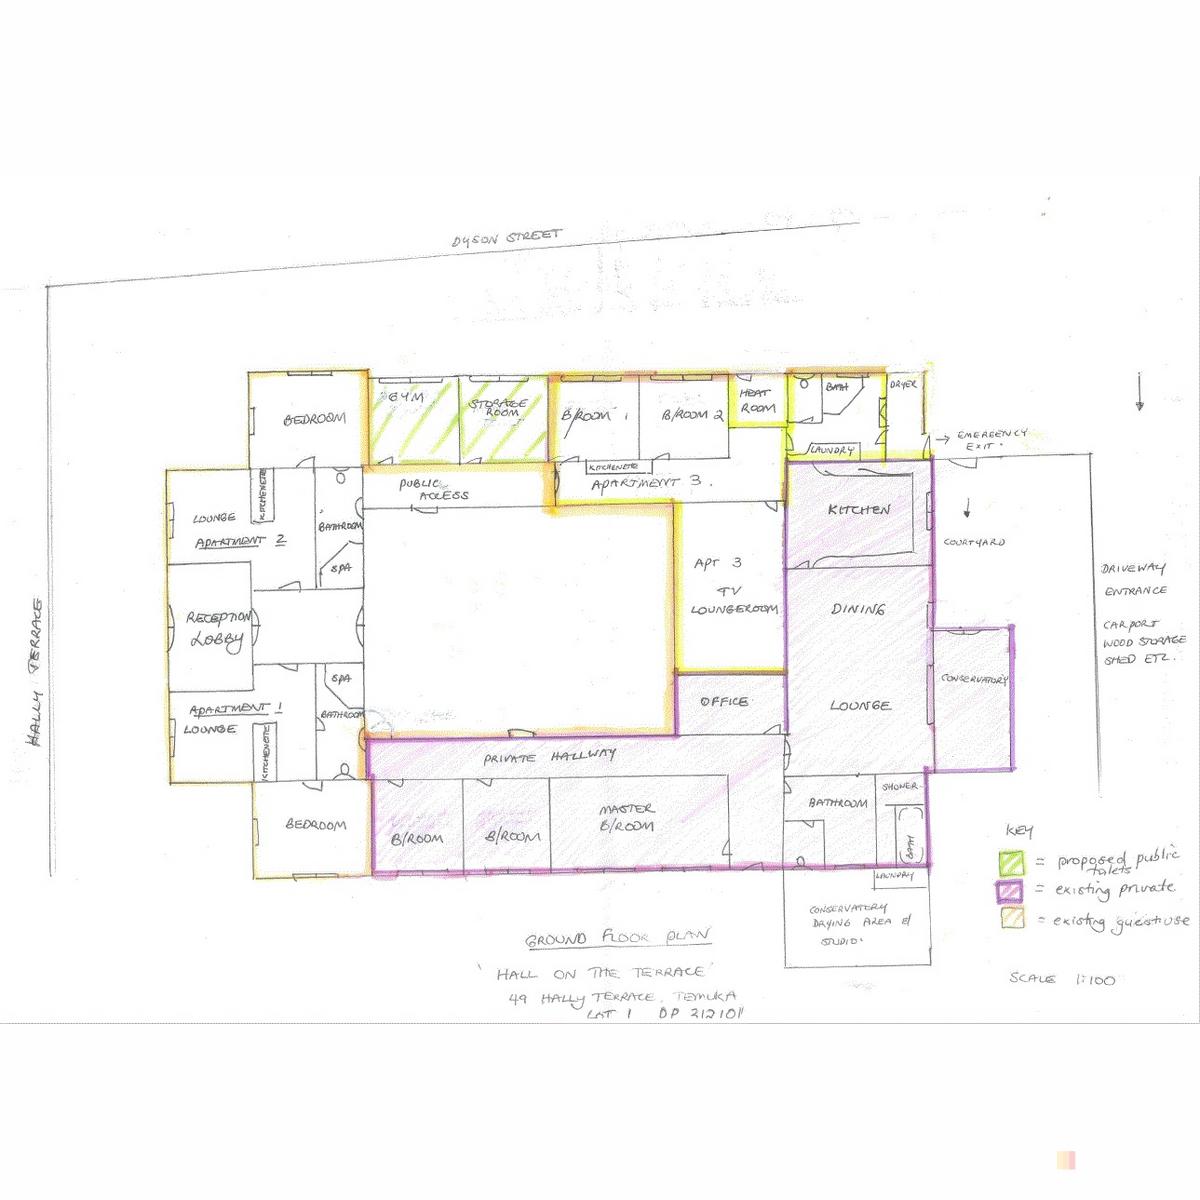 49 Hally Terrace Temukaproperty floorplan image